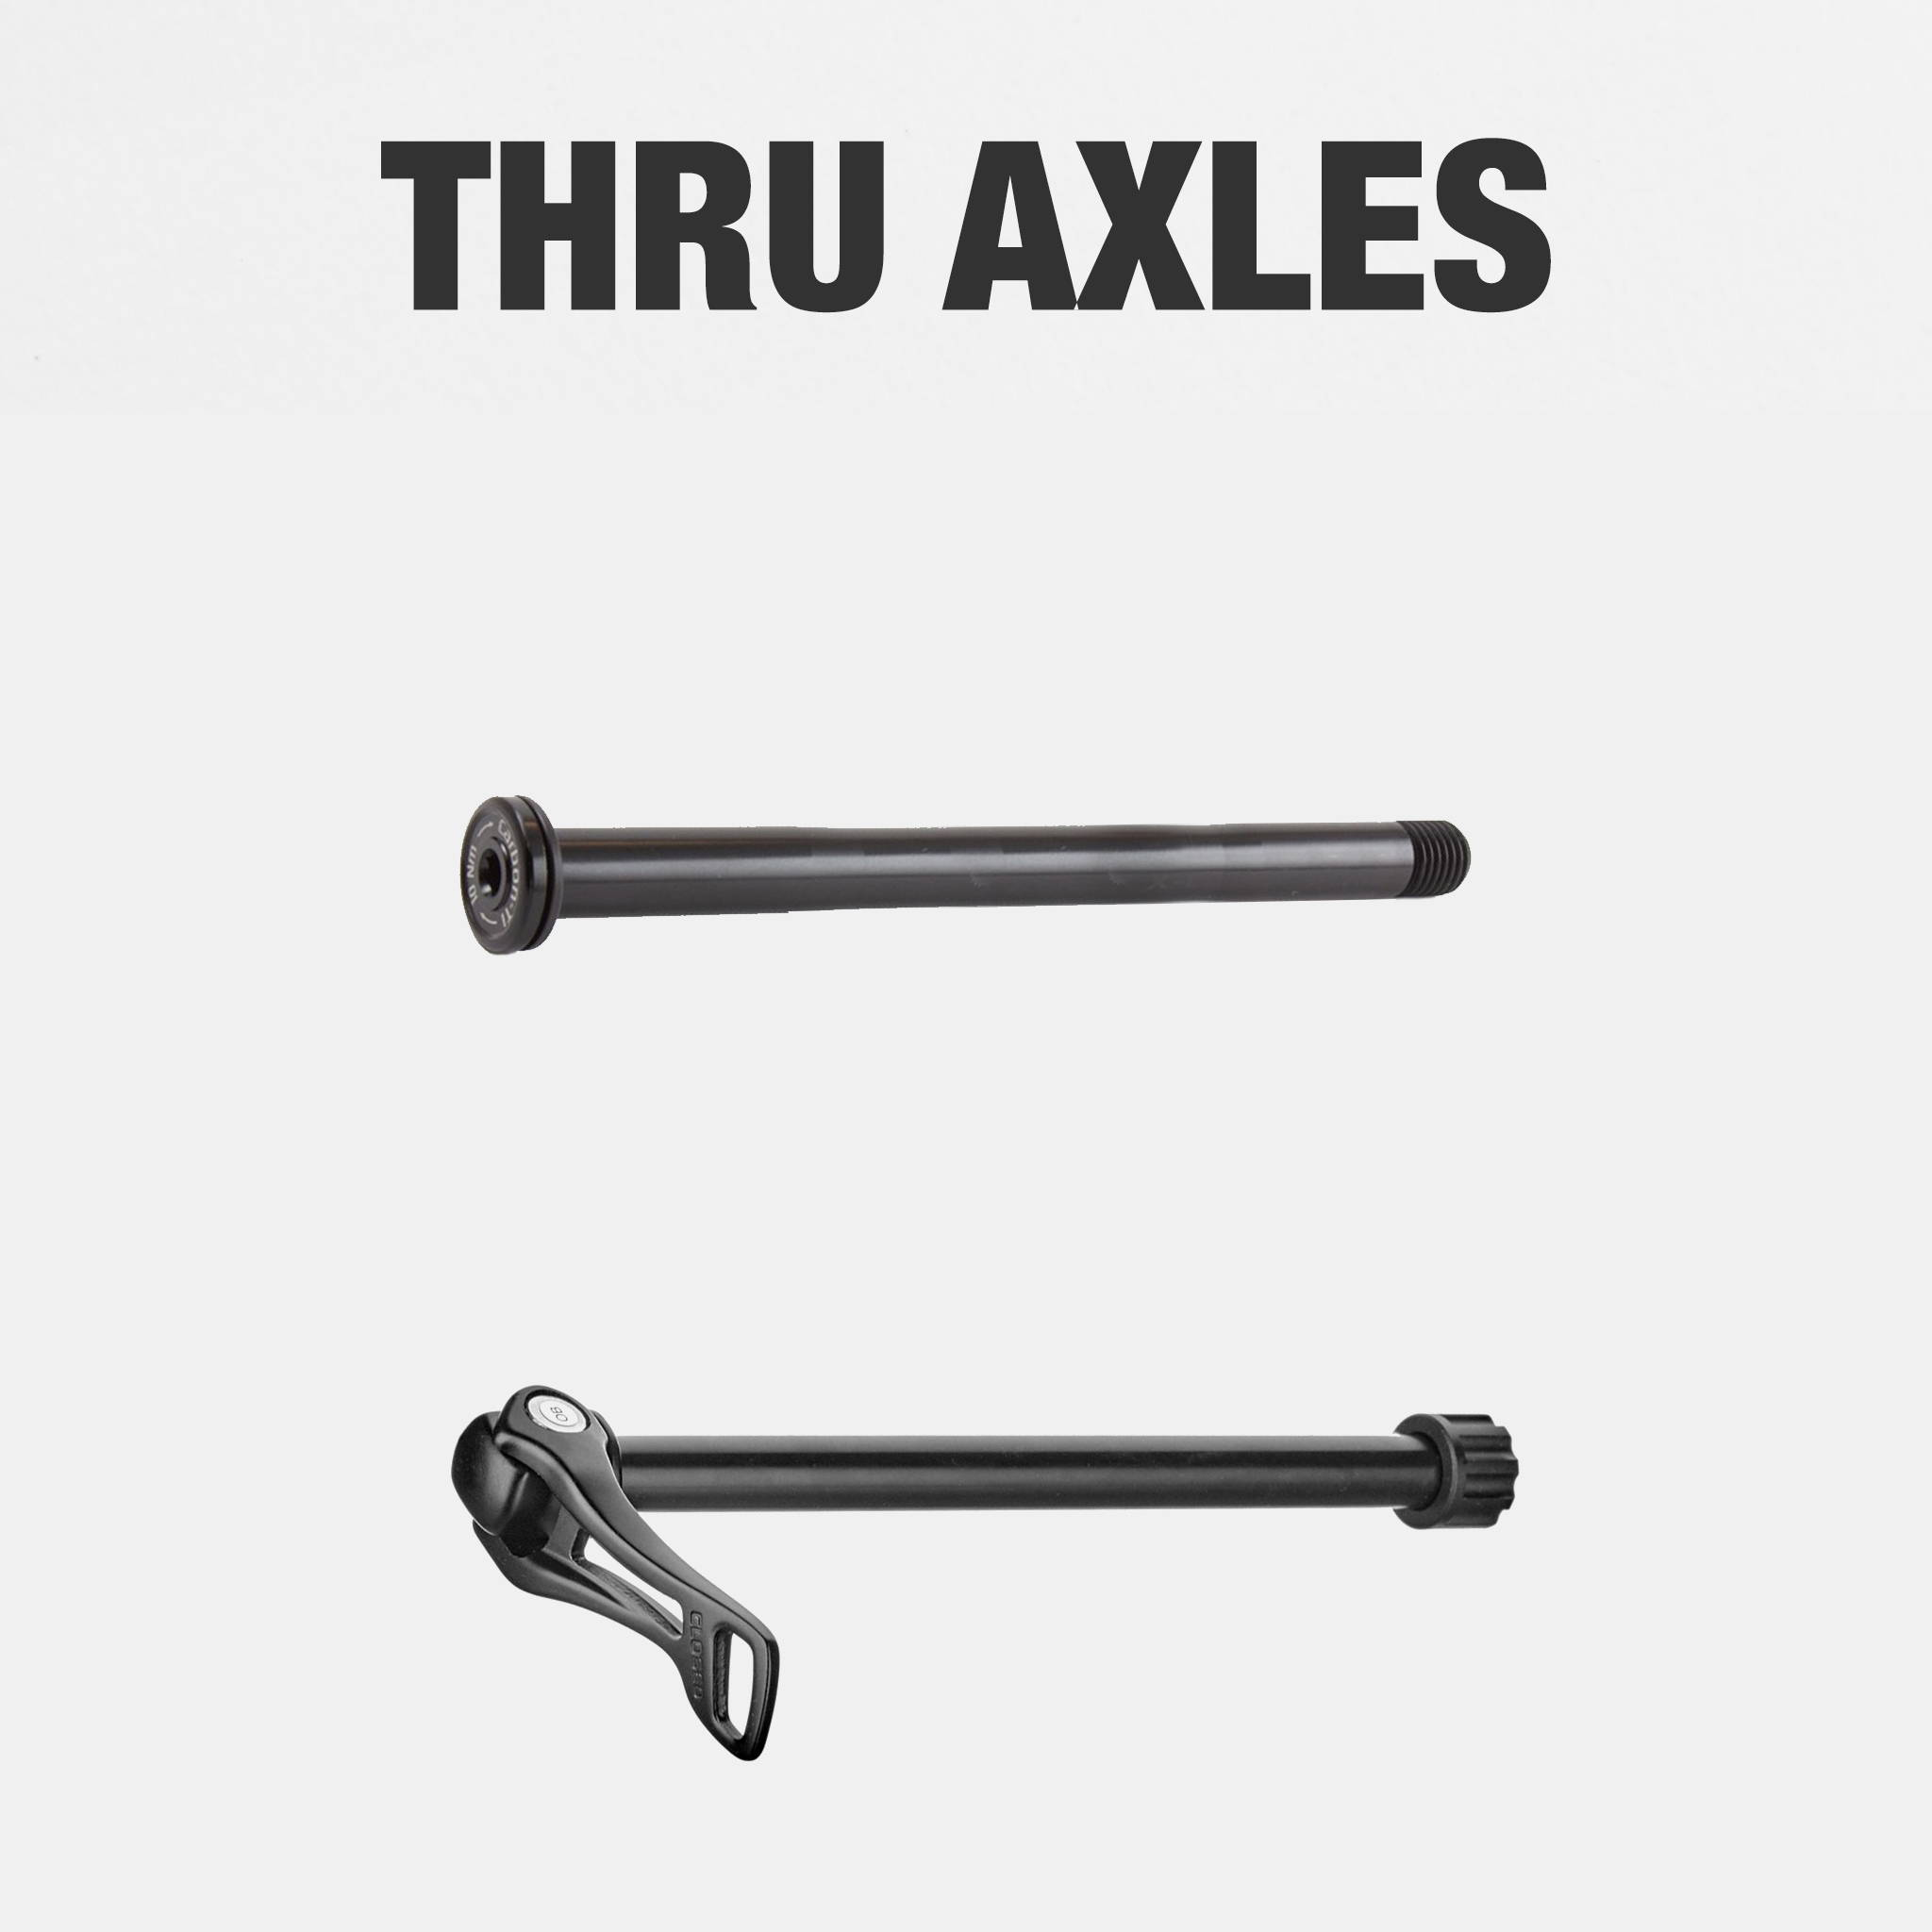 Different types of Thru axles